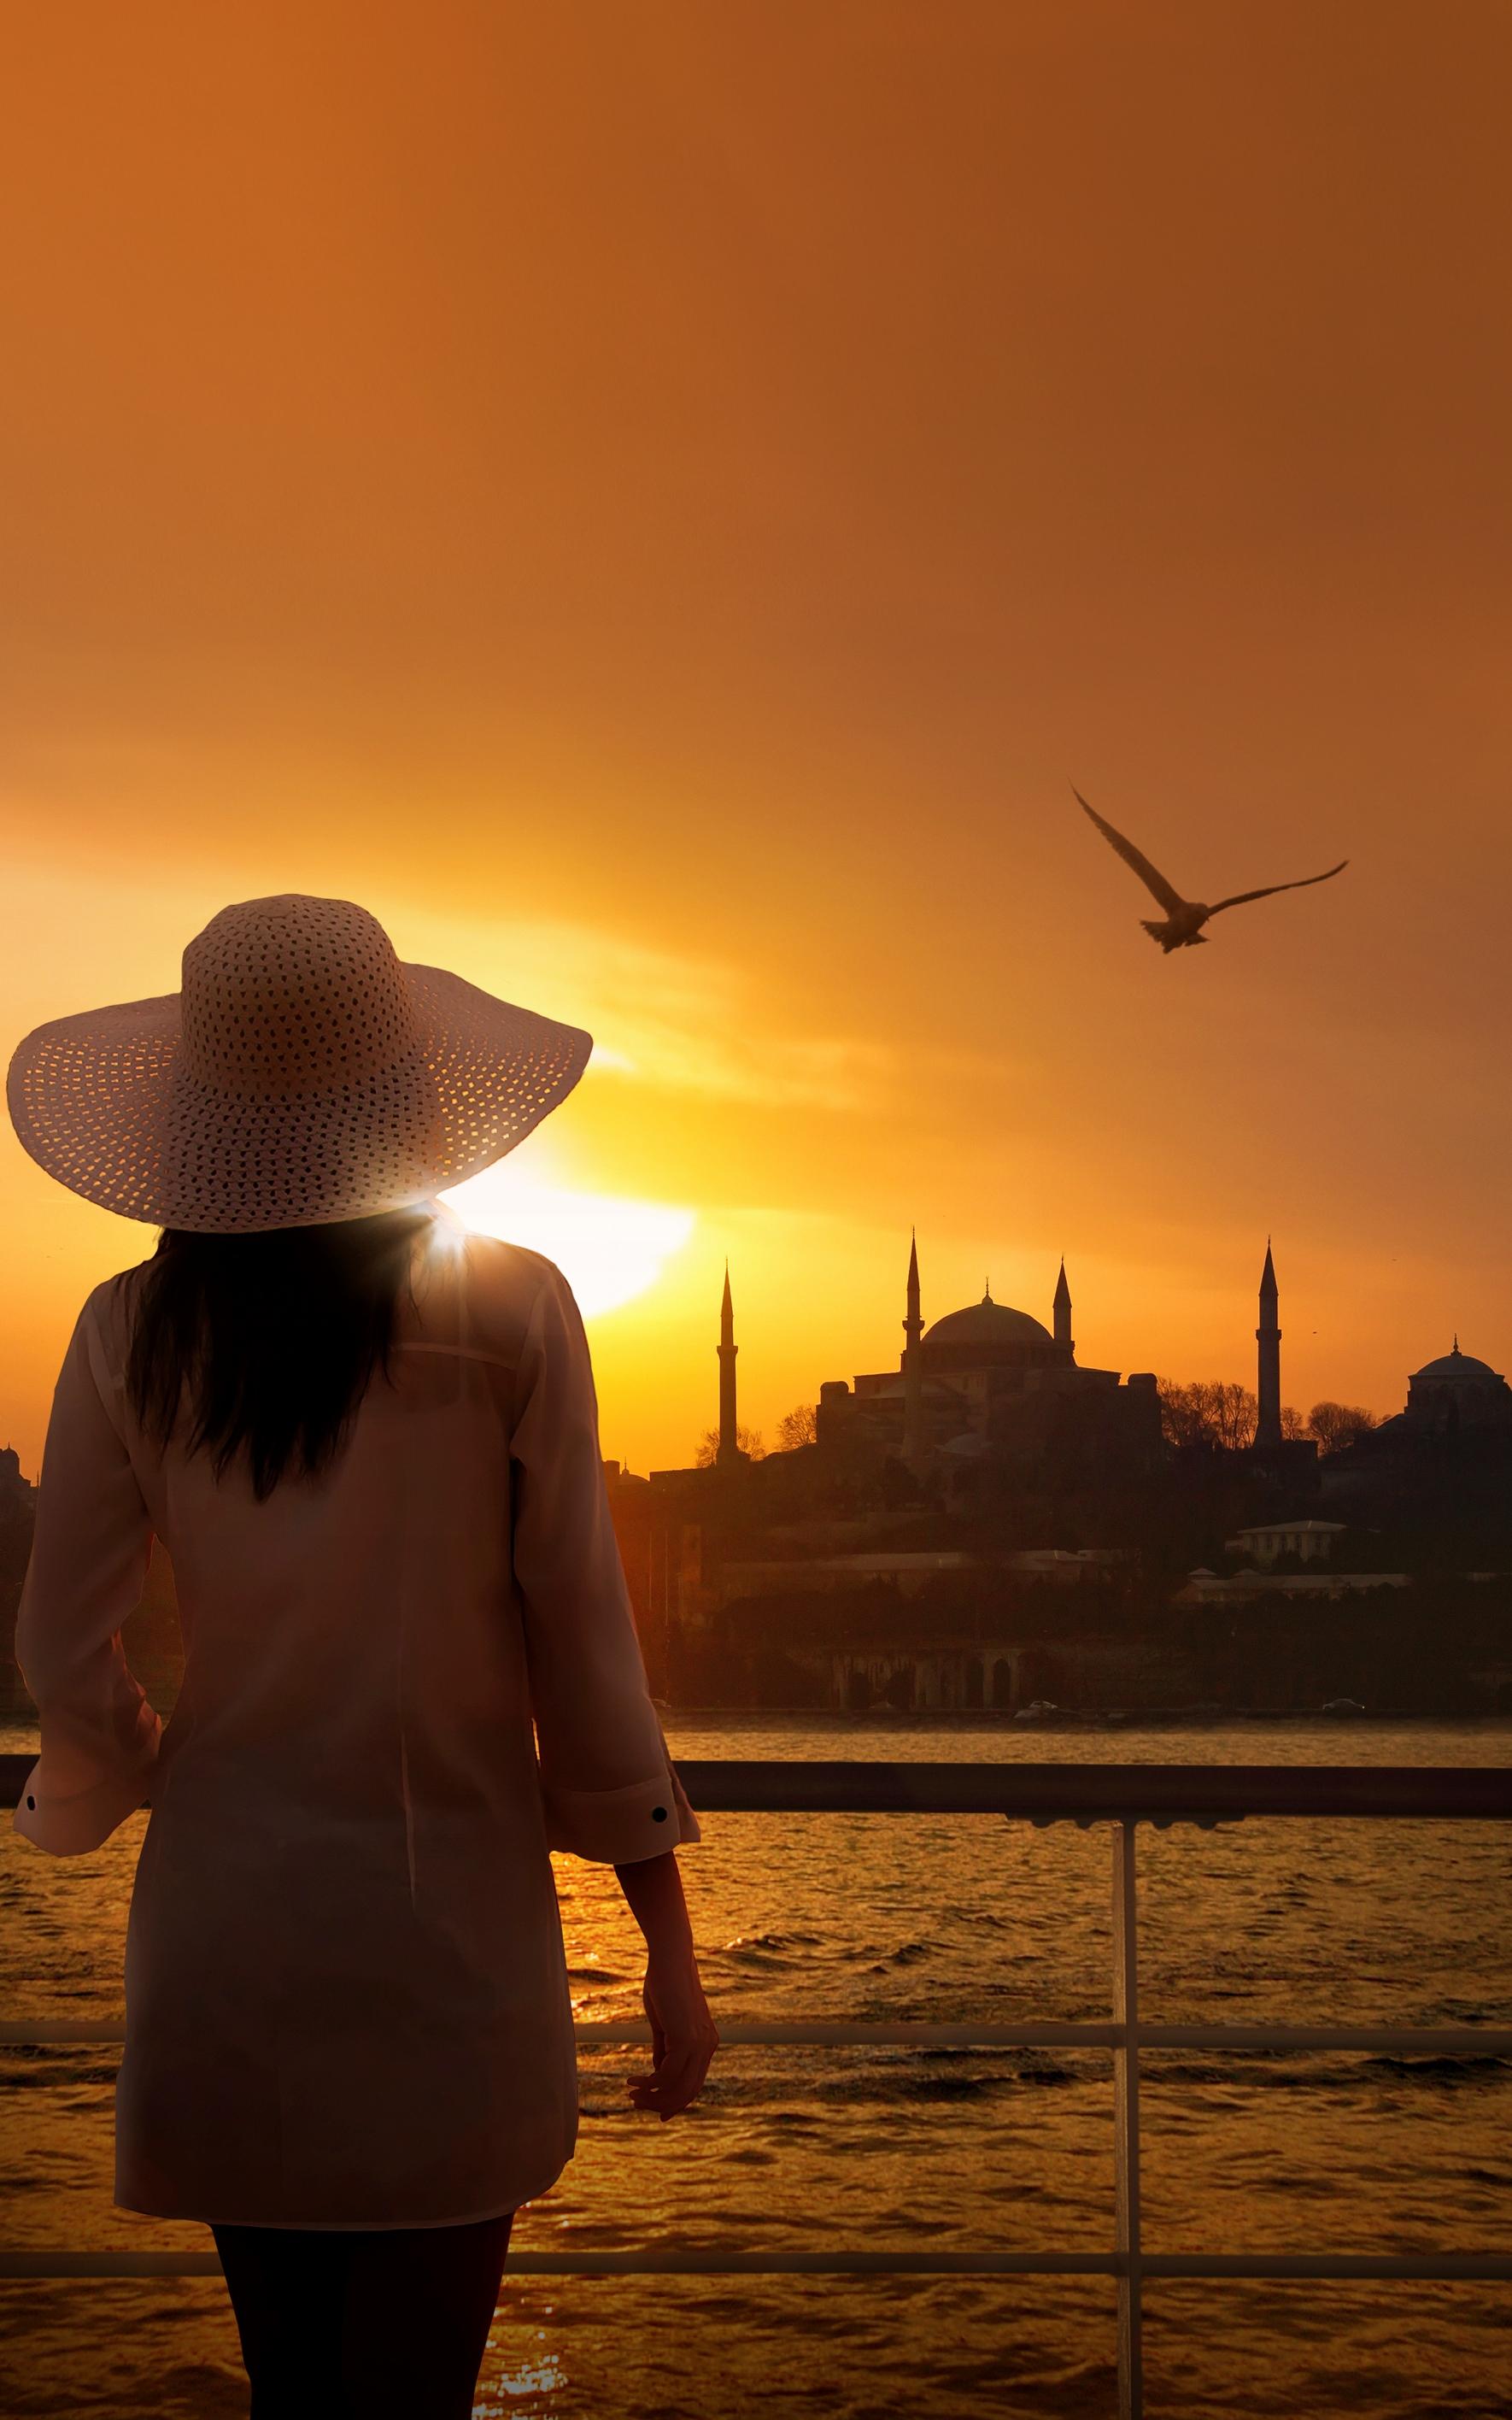 Image 1 - Turkey